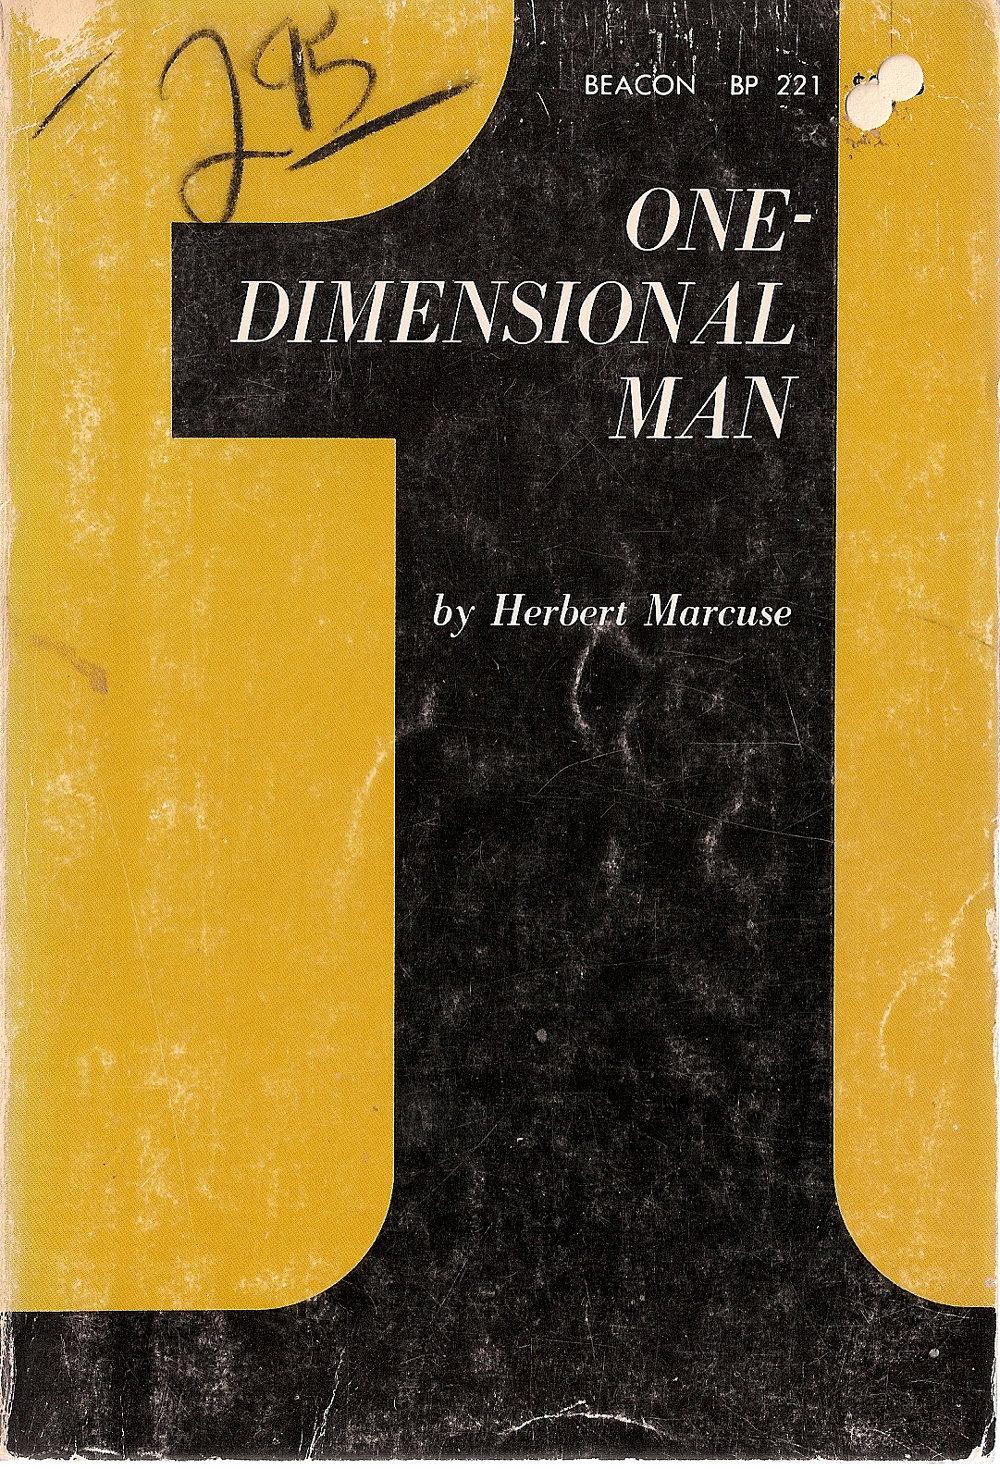 https://www.groene.nl/uploads/image/file/000/003/660/large_one-dimensional-man-cover.jpg